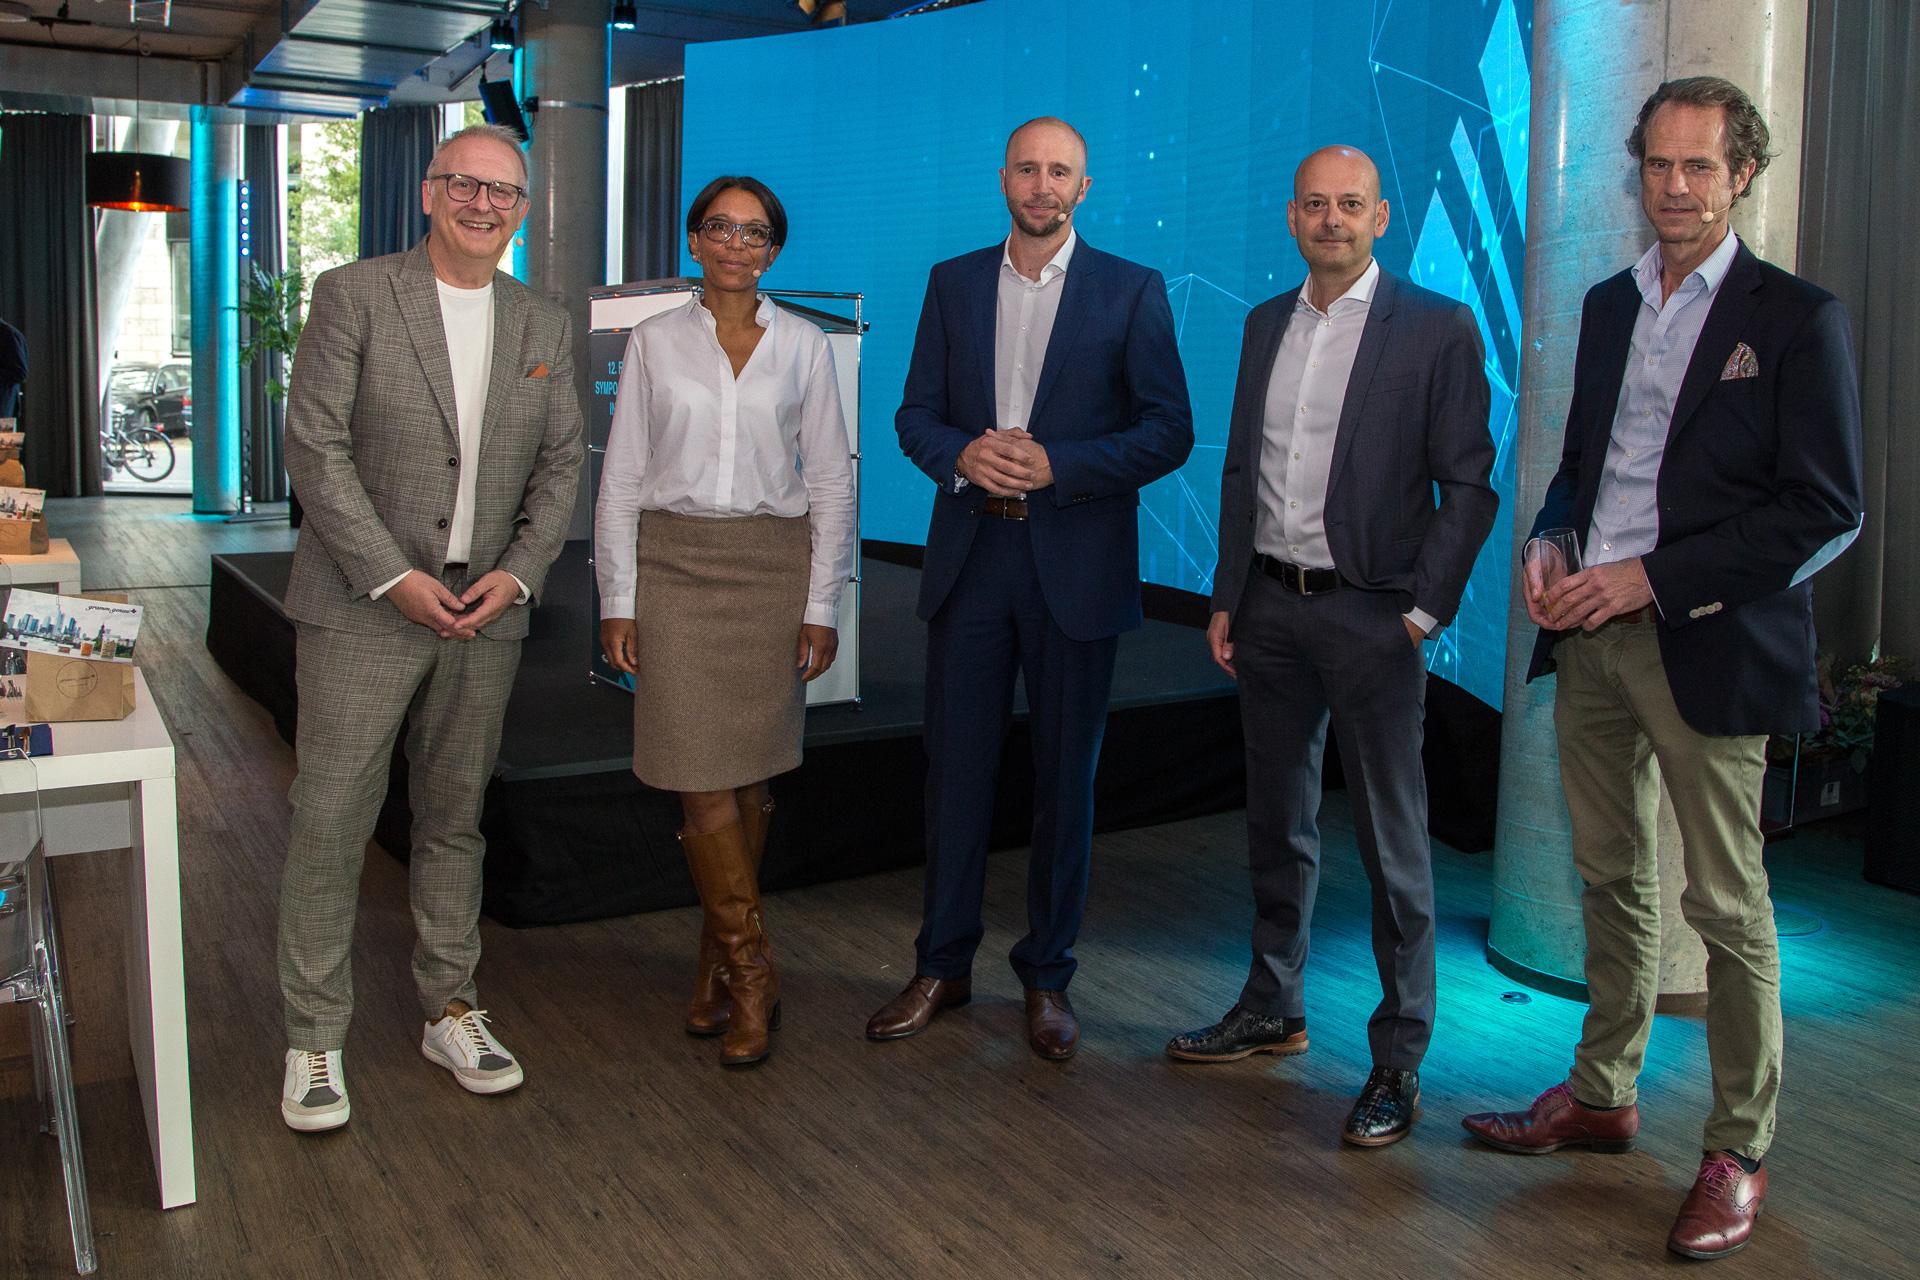 Bethmann, Kugel, Ludwig, Brink und Loebbecke